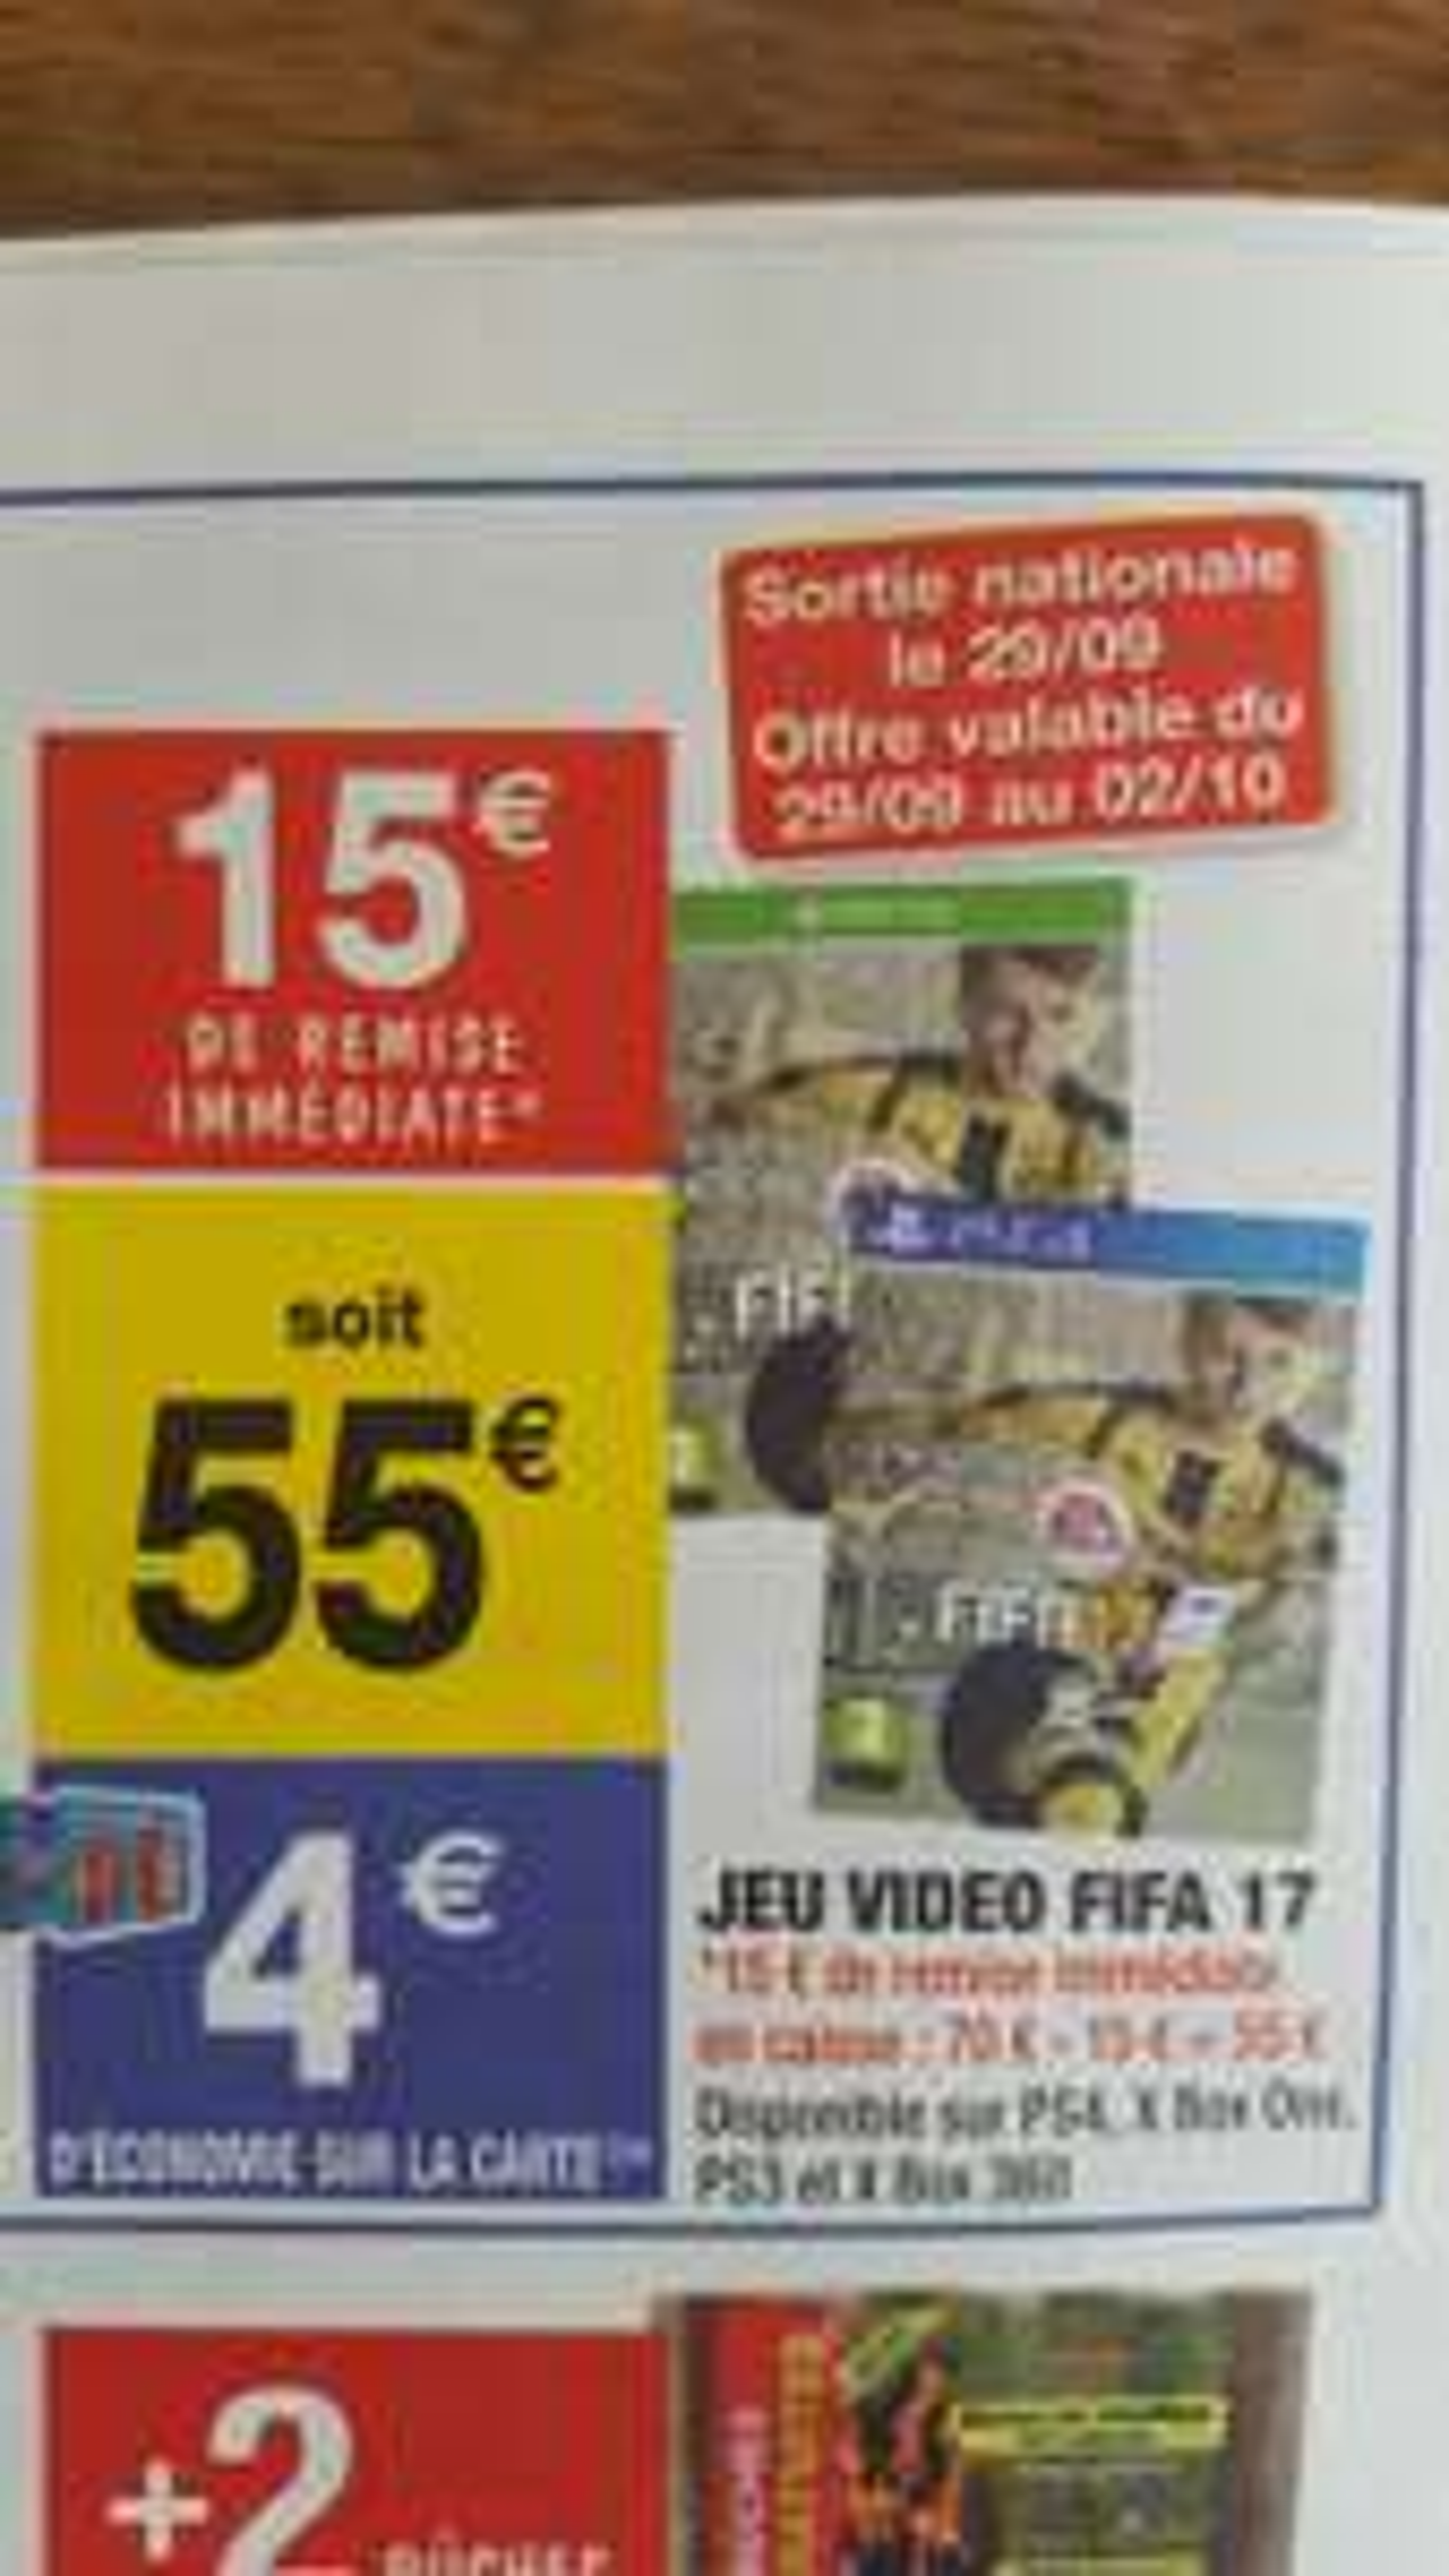 Fifa 17 sur PS4 & Xbox One (via 4€ sur la carte)